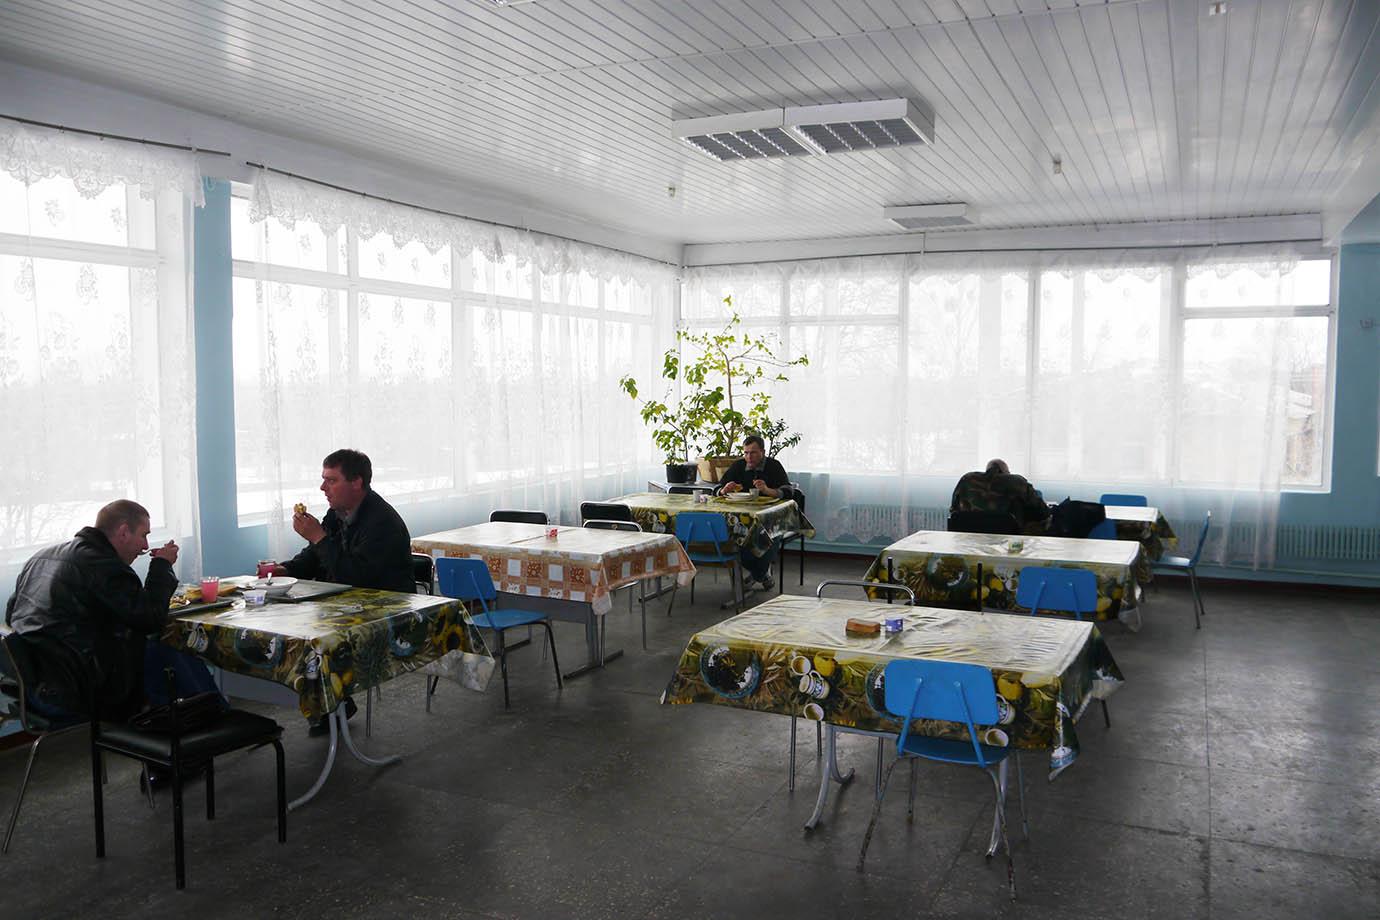 chernobyl-cafeteria1